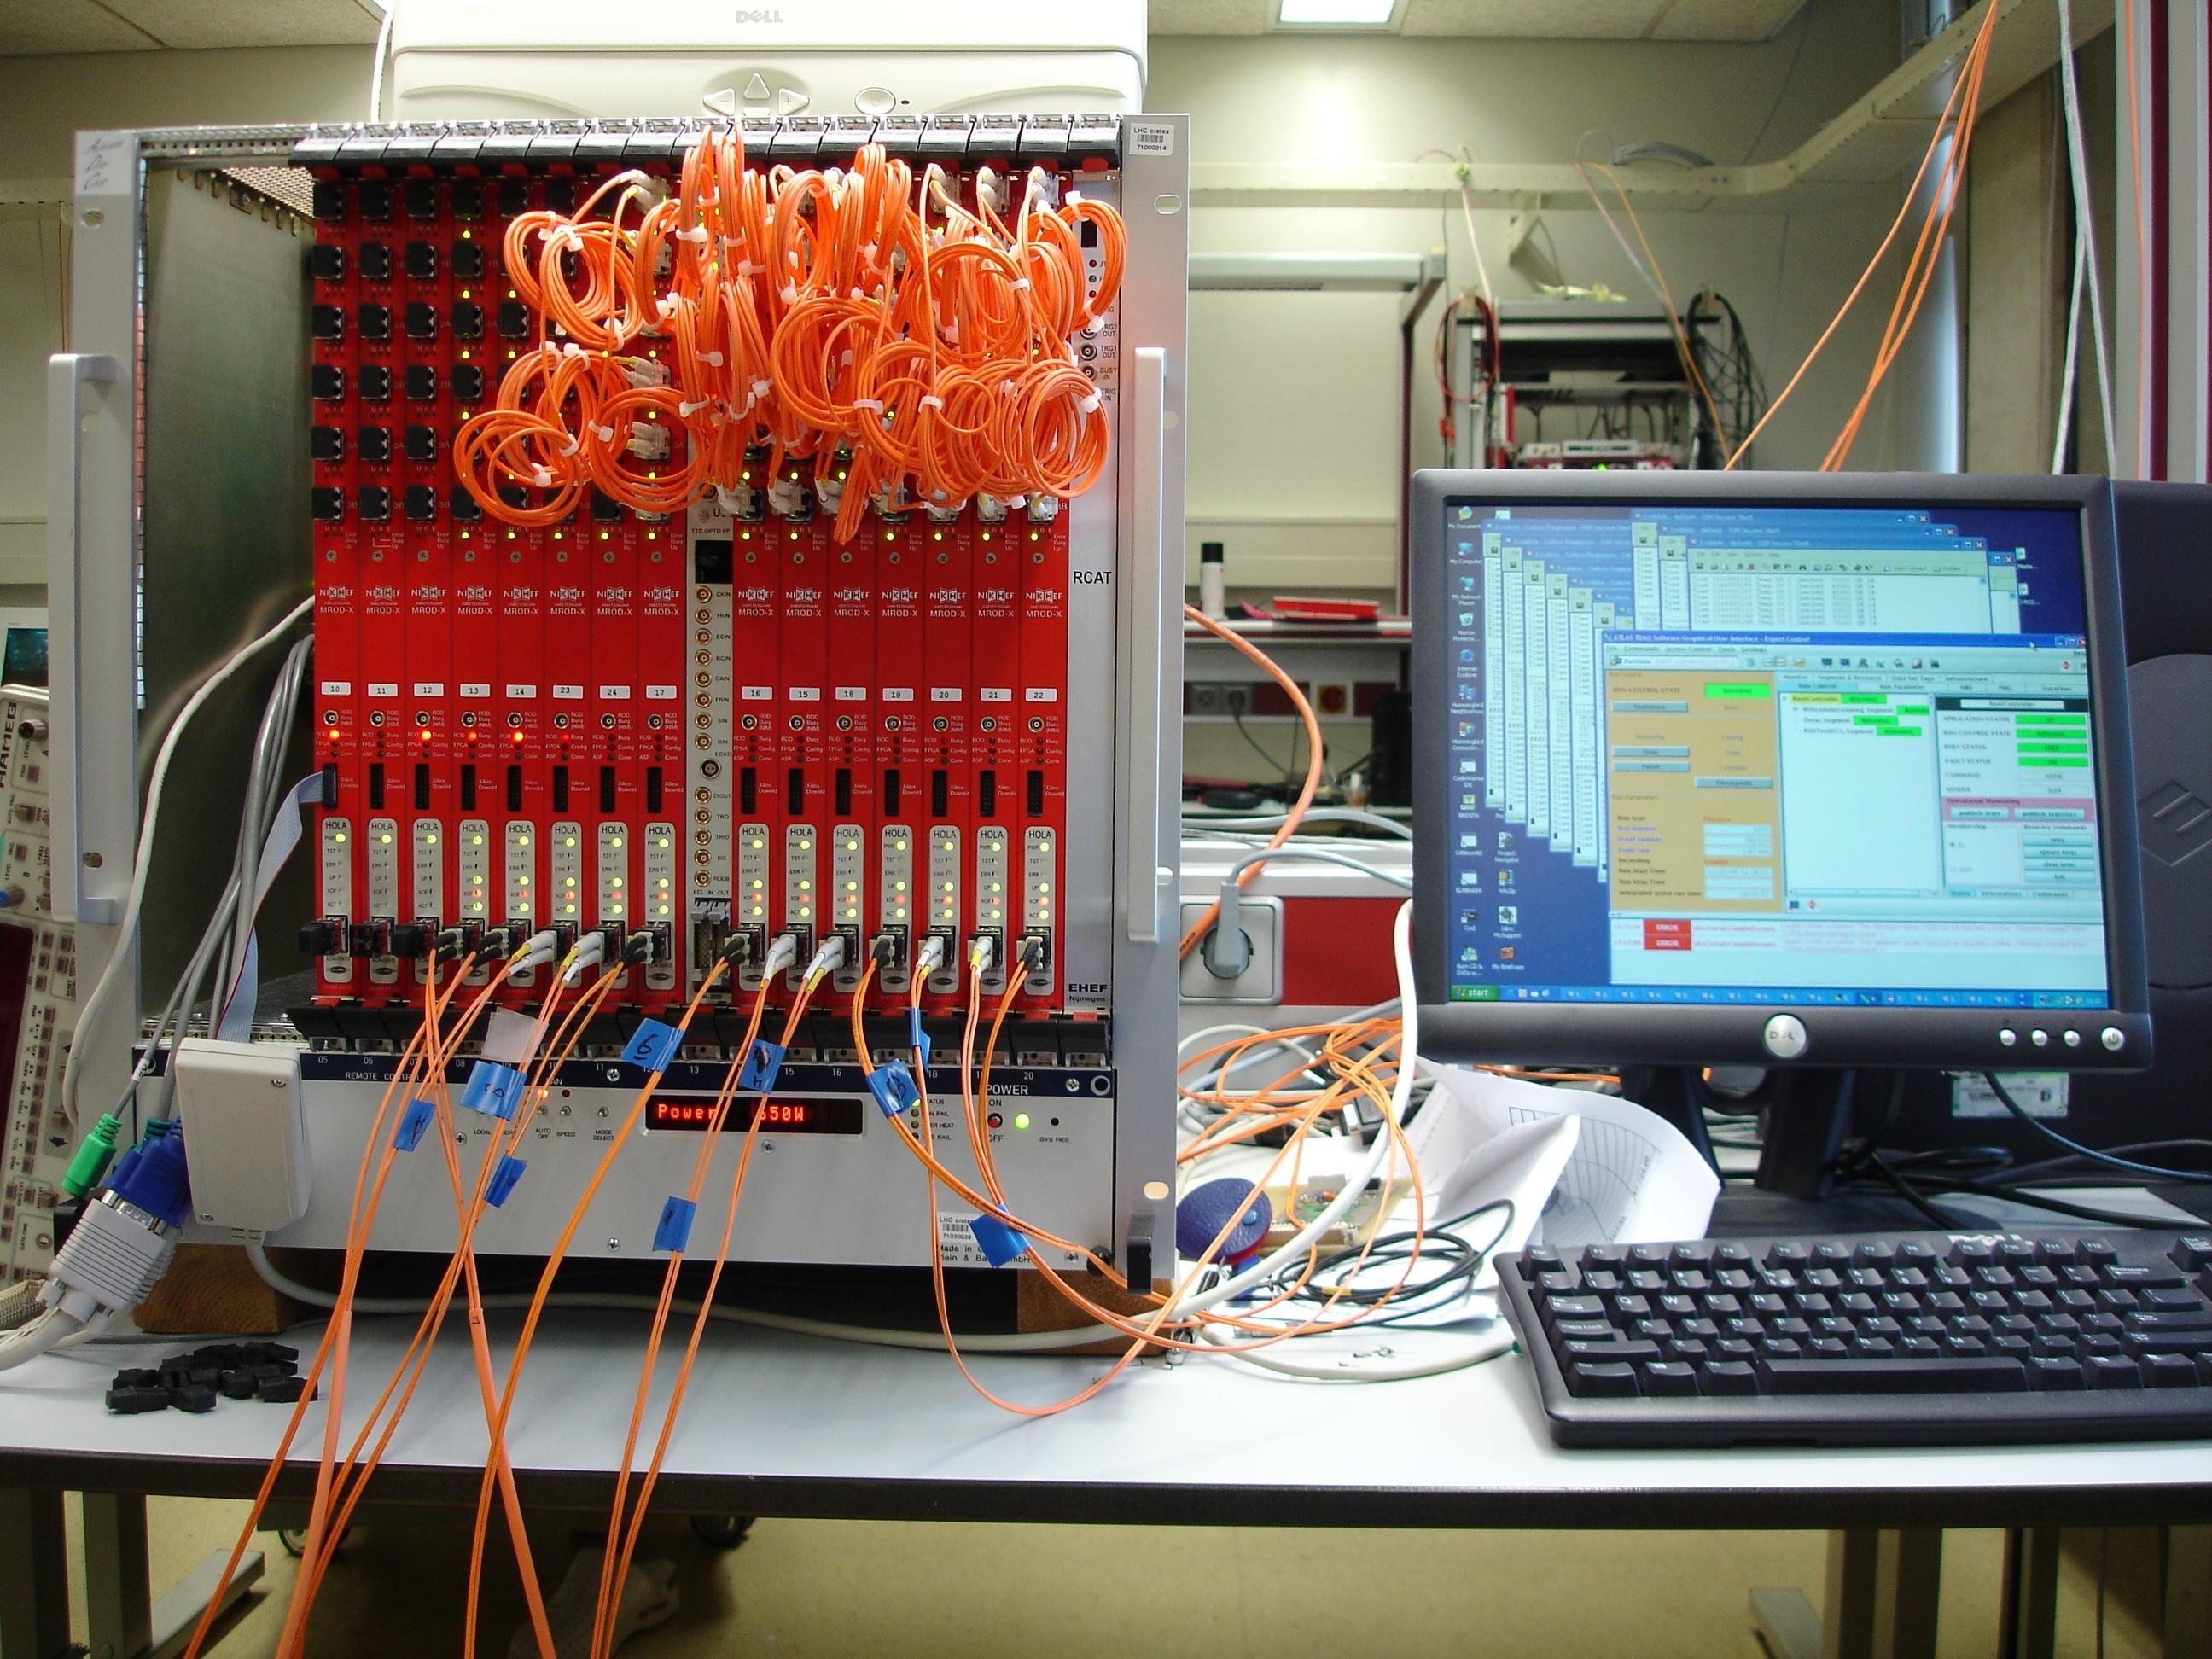 MROD test setup